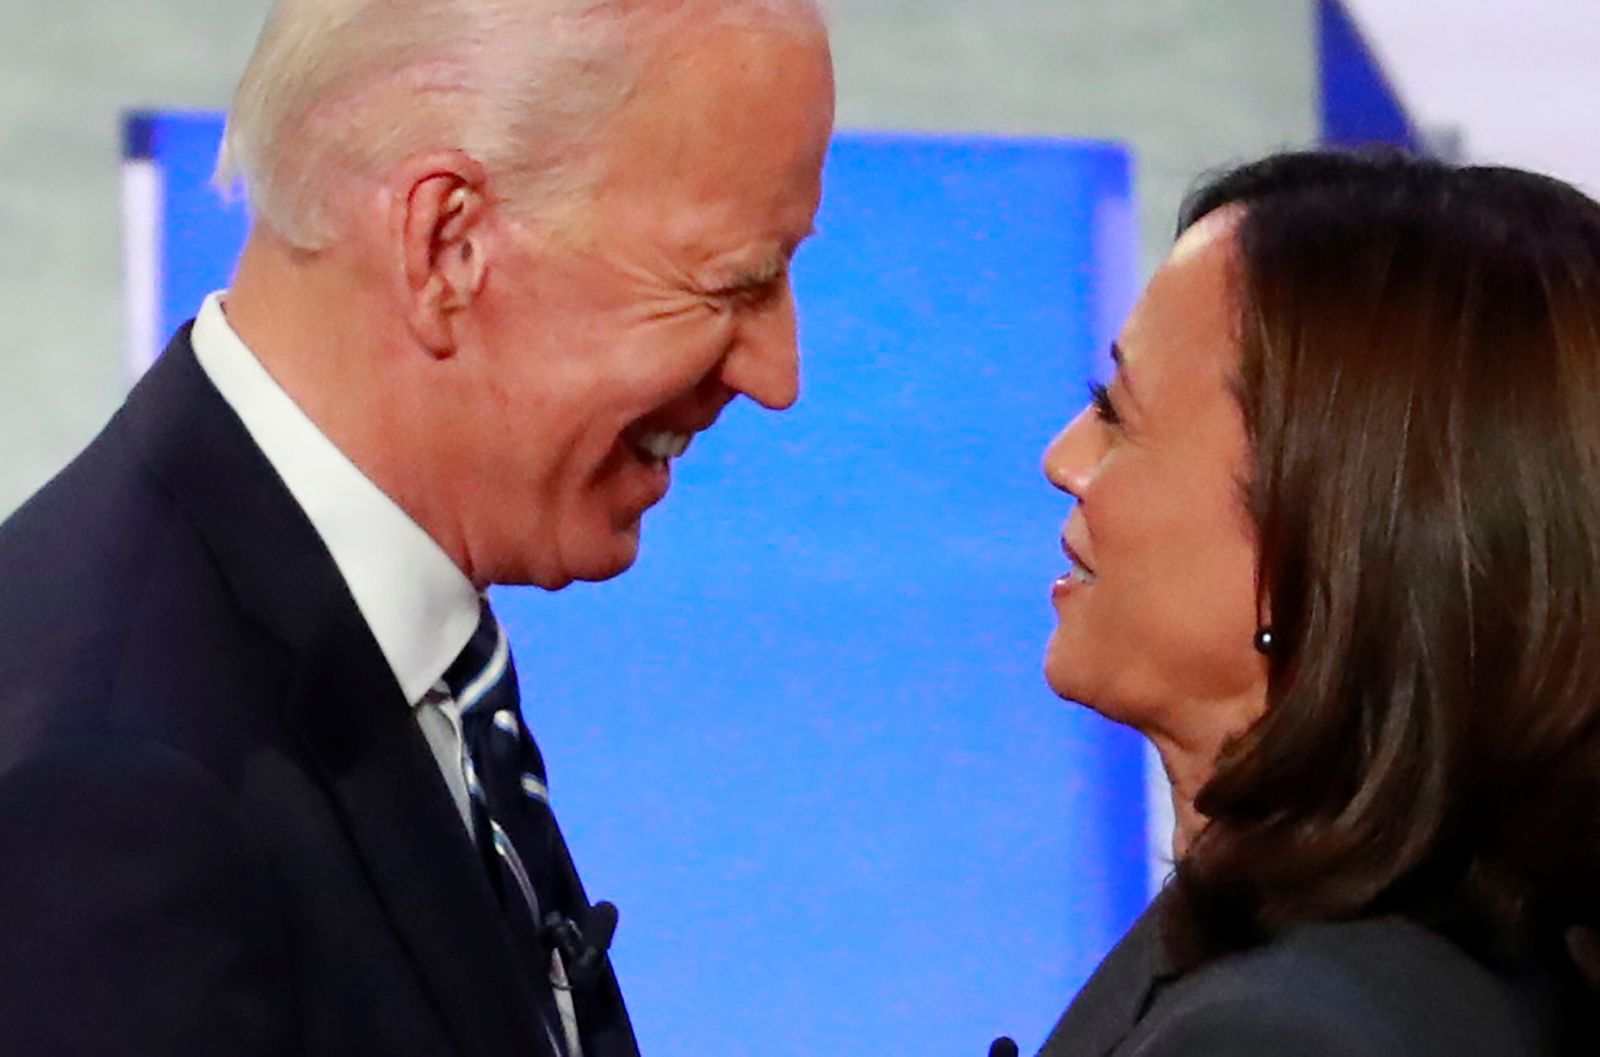 Candidates former Vice President Joe Biden and U.S. Senator Kamala Harris take the stage on the second night of the second 2020 Democratic U.S. presidential debate in Detroit